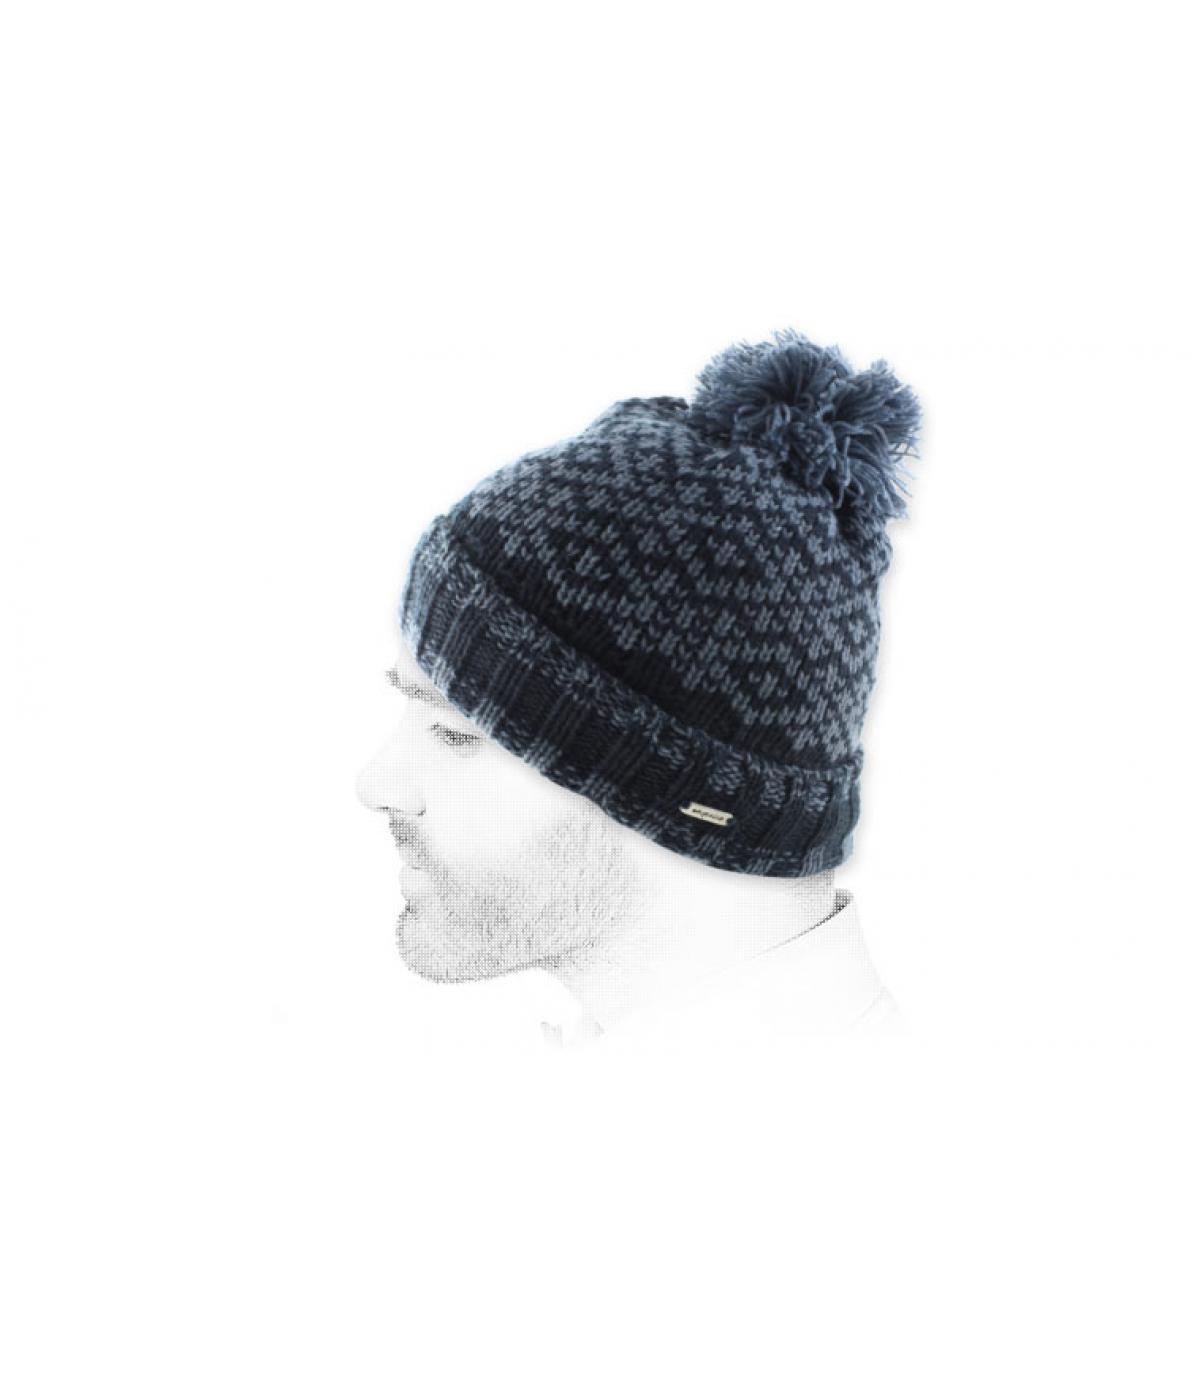 donkerblauwe cap leeswijzer